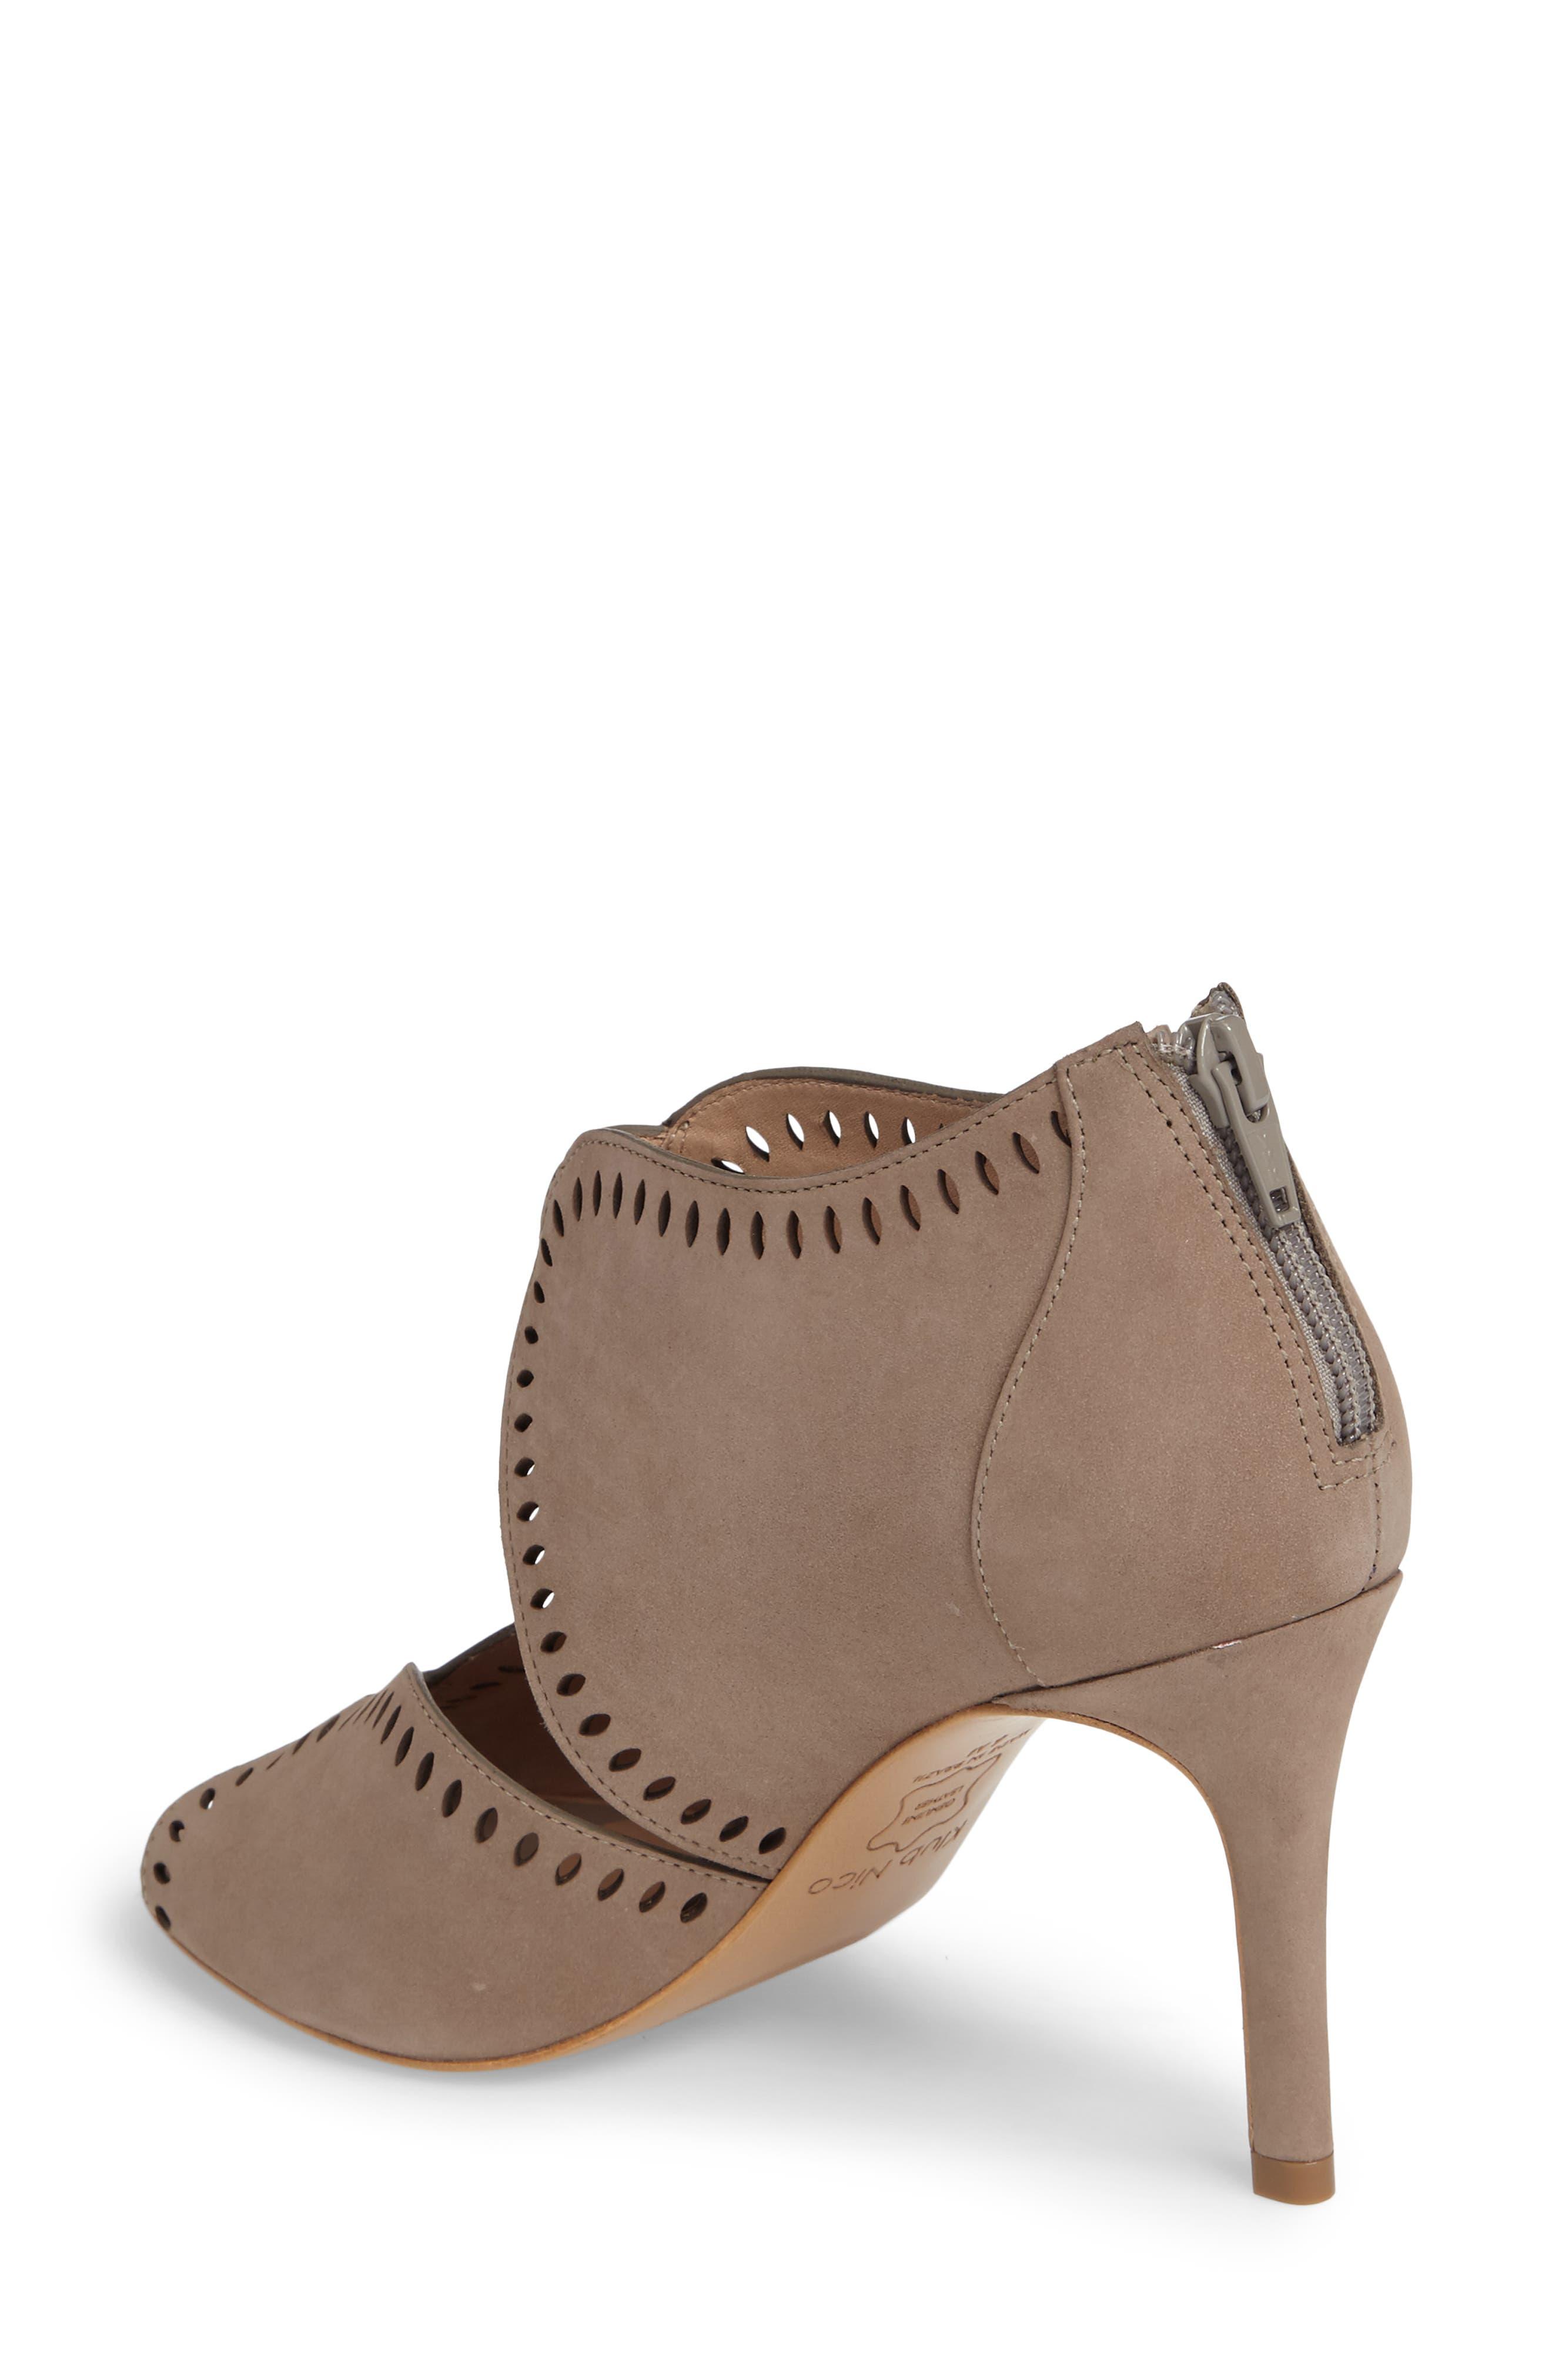 Mallia Perforated Sandal,                             Alternate thumbnail 4, color,